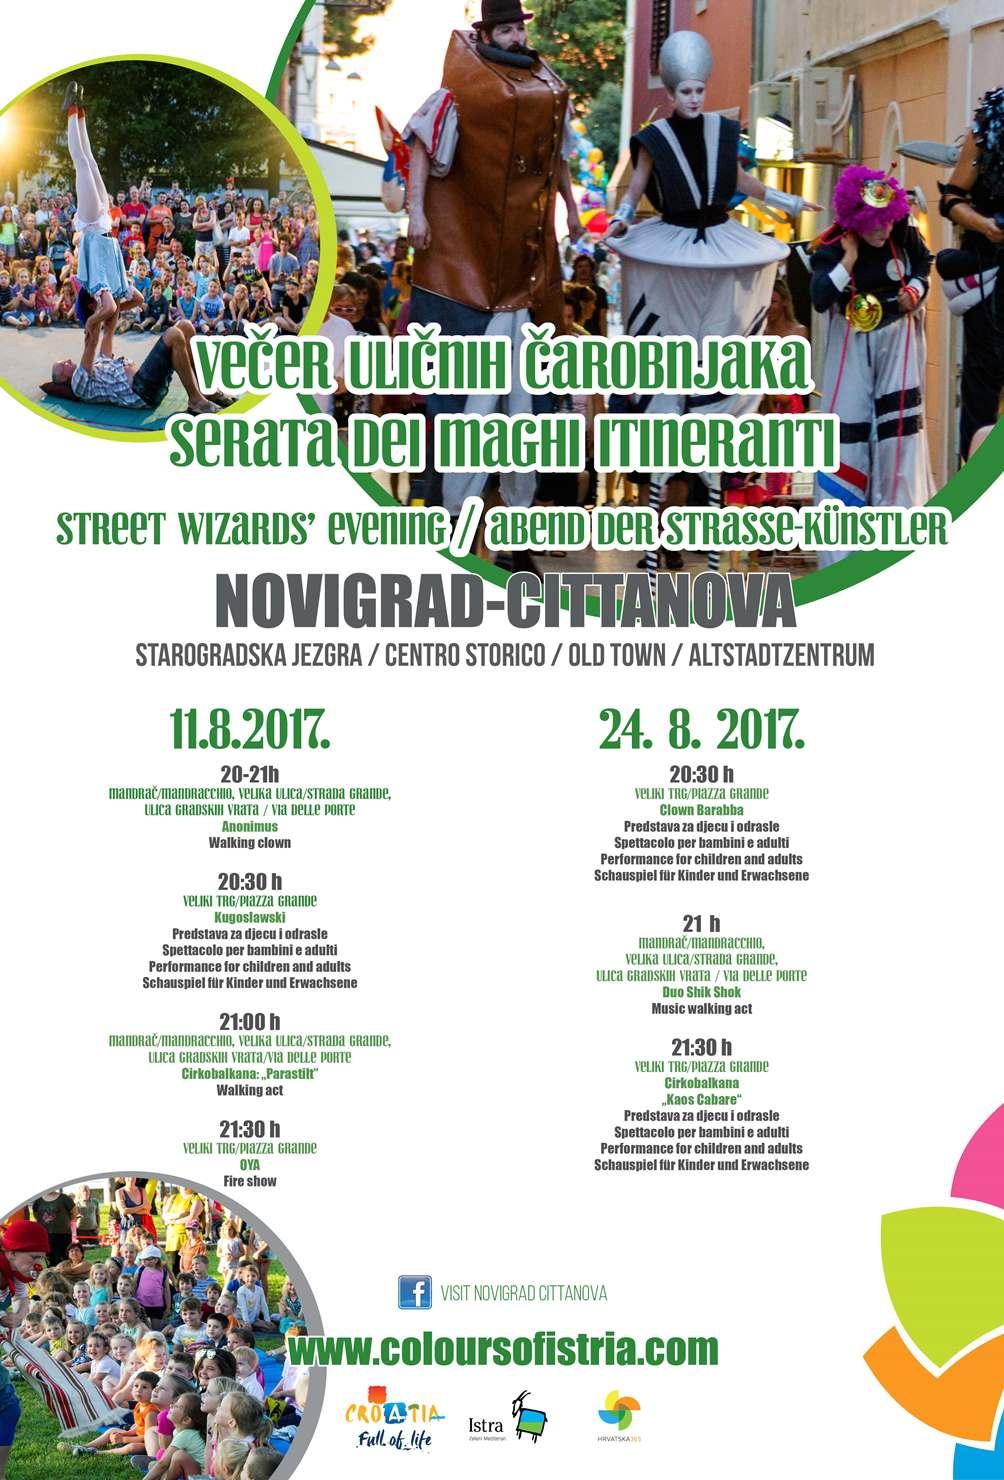 http://www.novigrad.hr/vecher_ulichnih_charobnjaka10